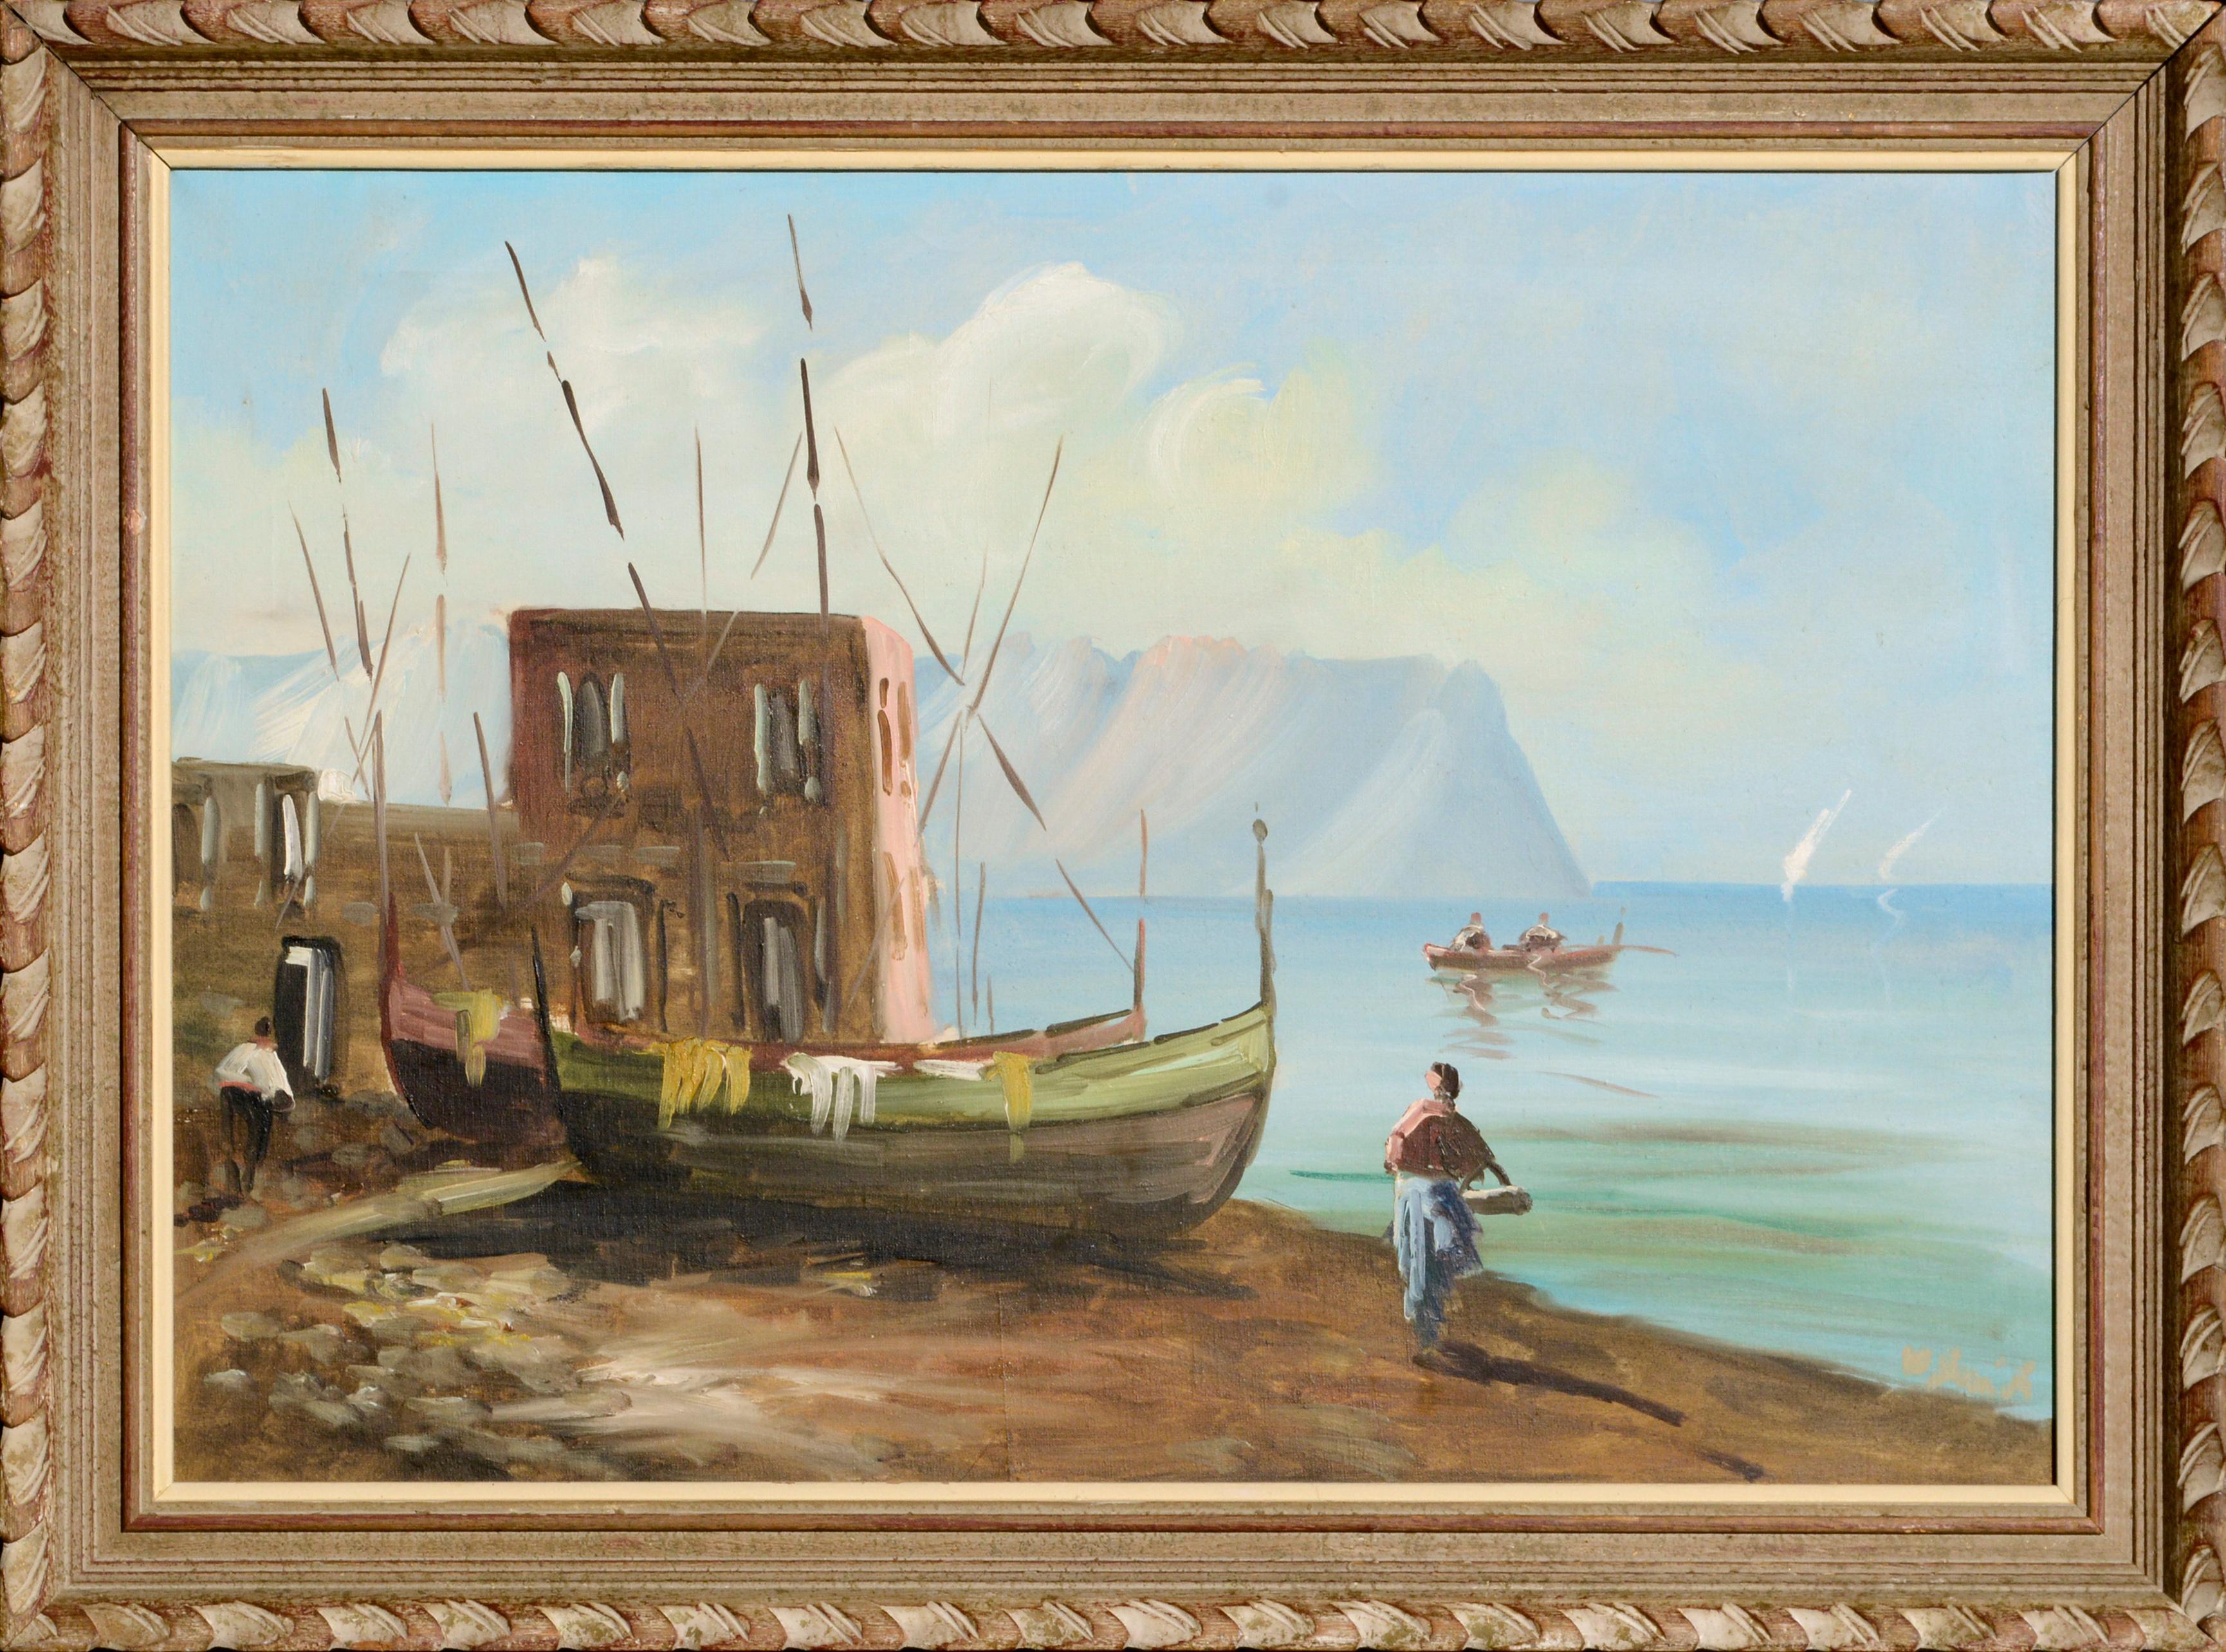 Boats on the Shore - Figurative Landscape